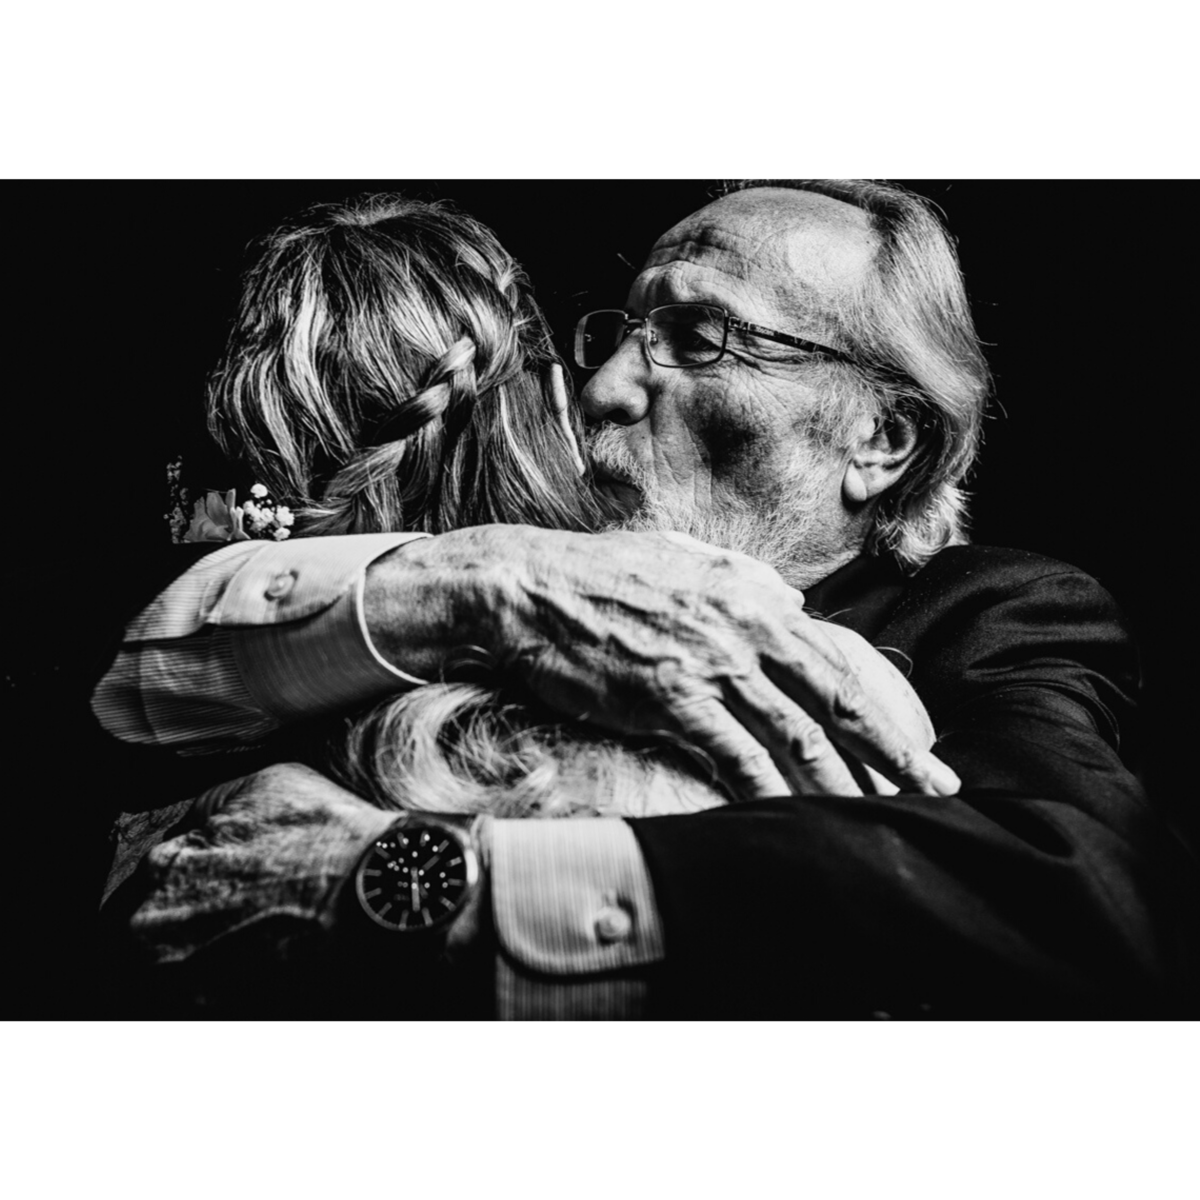 Imagem capa - Finalist of Collection 55 - Fearless Photographers por Joanna Pantigoso